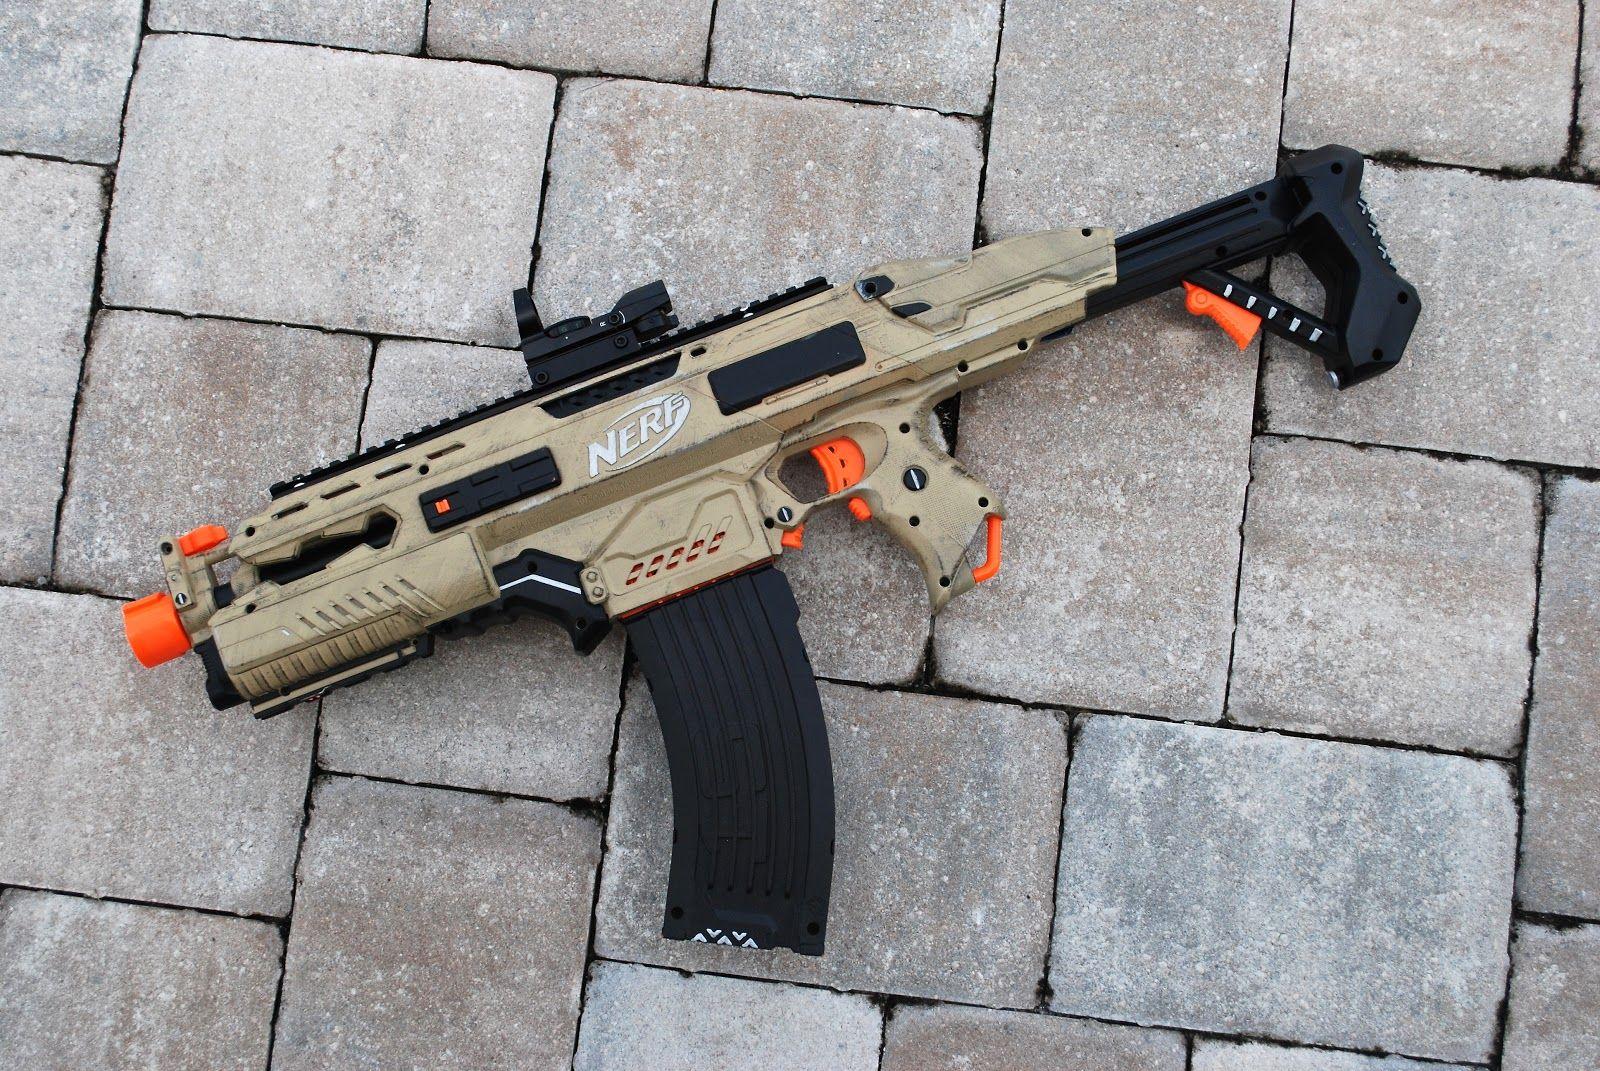 Image result for coop772 rapidstrike paint job nerf guns